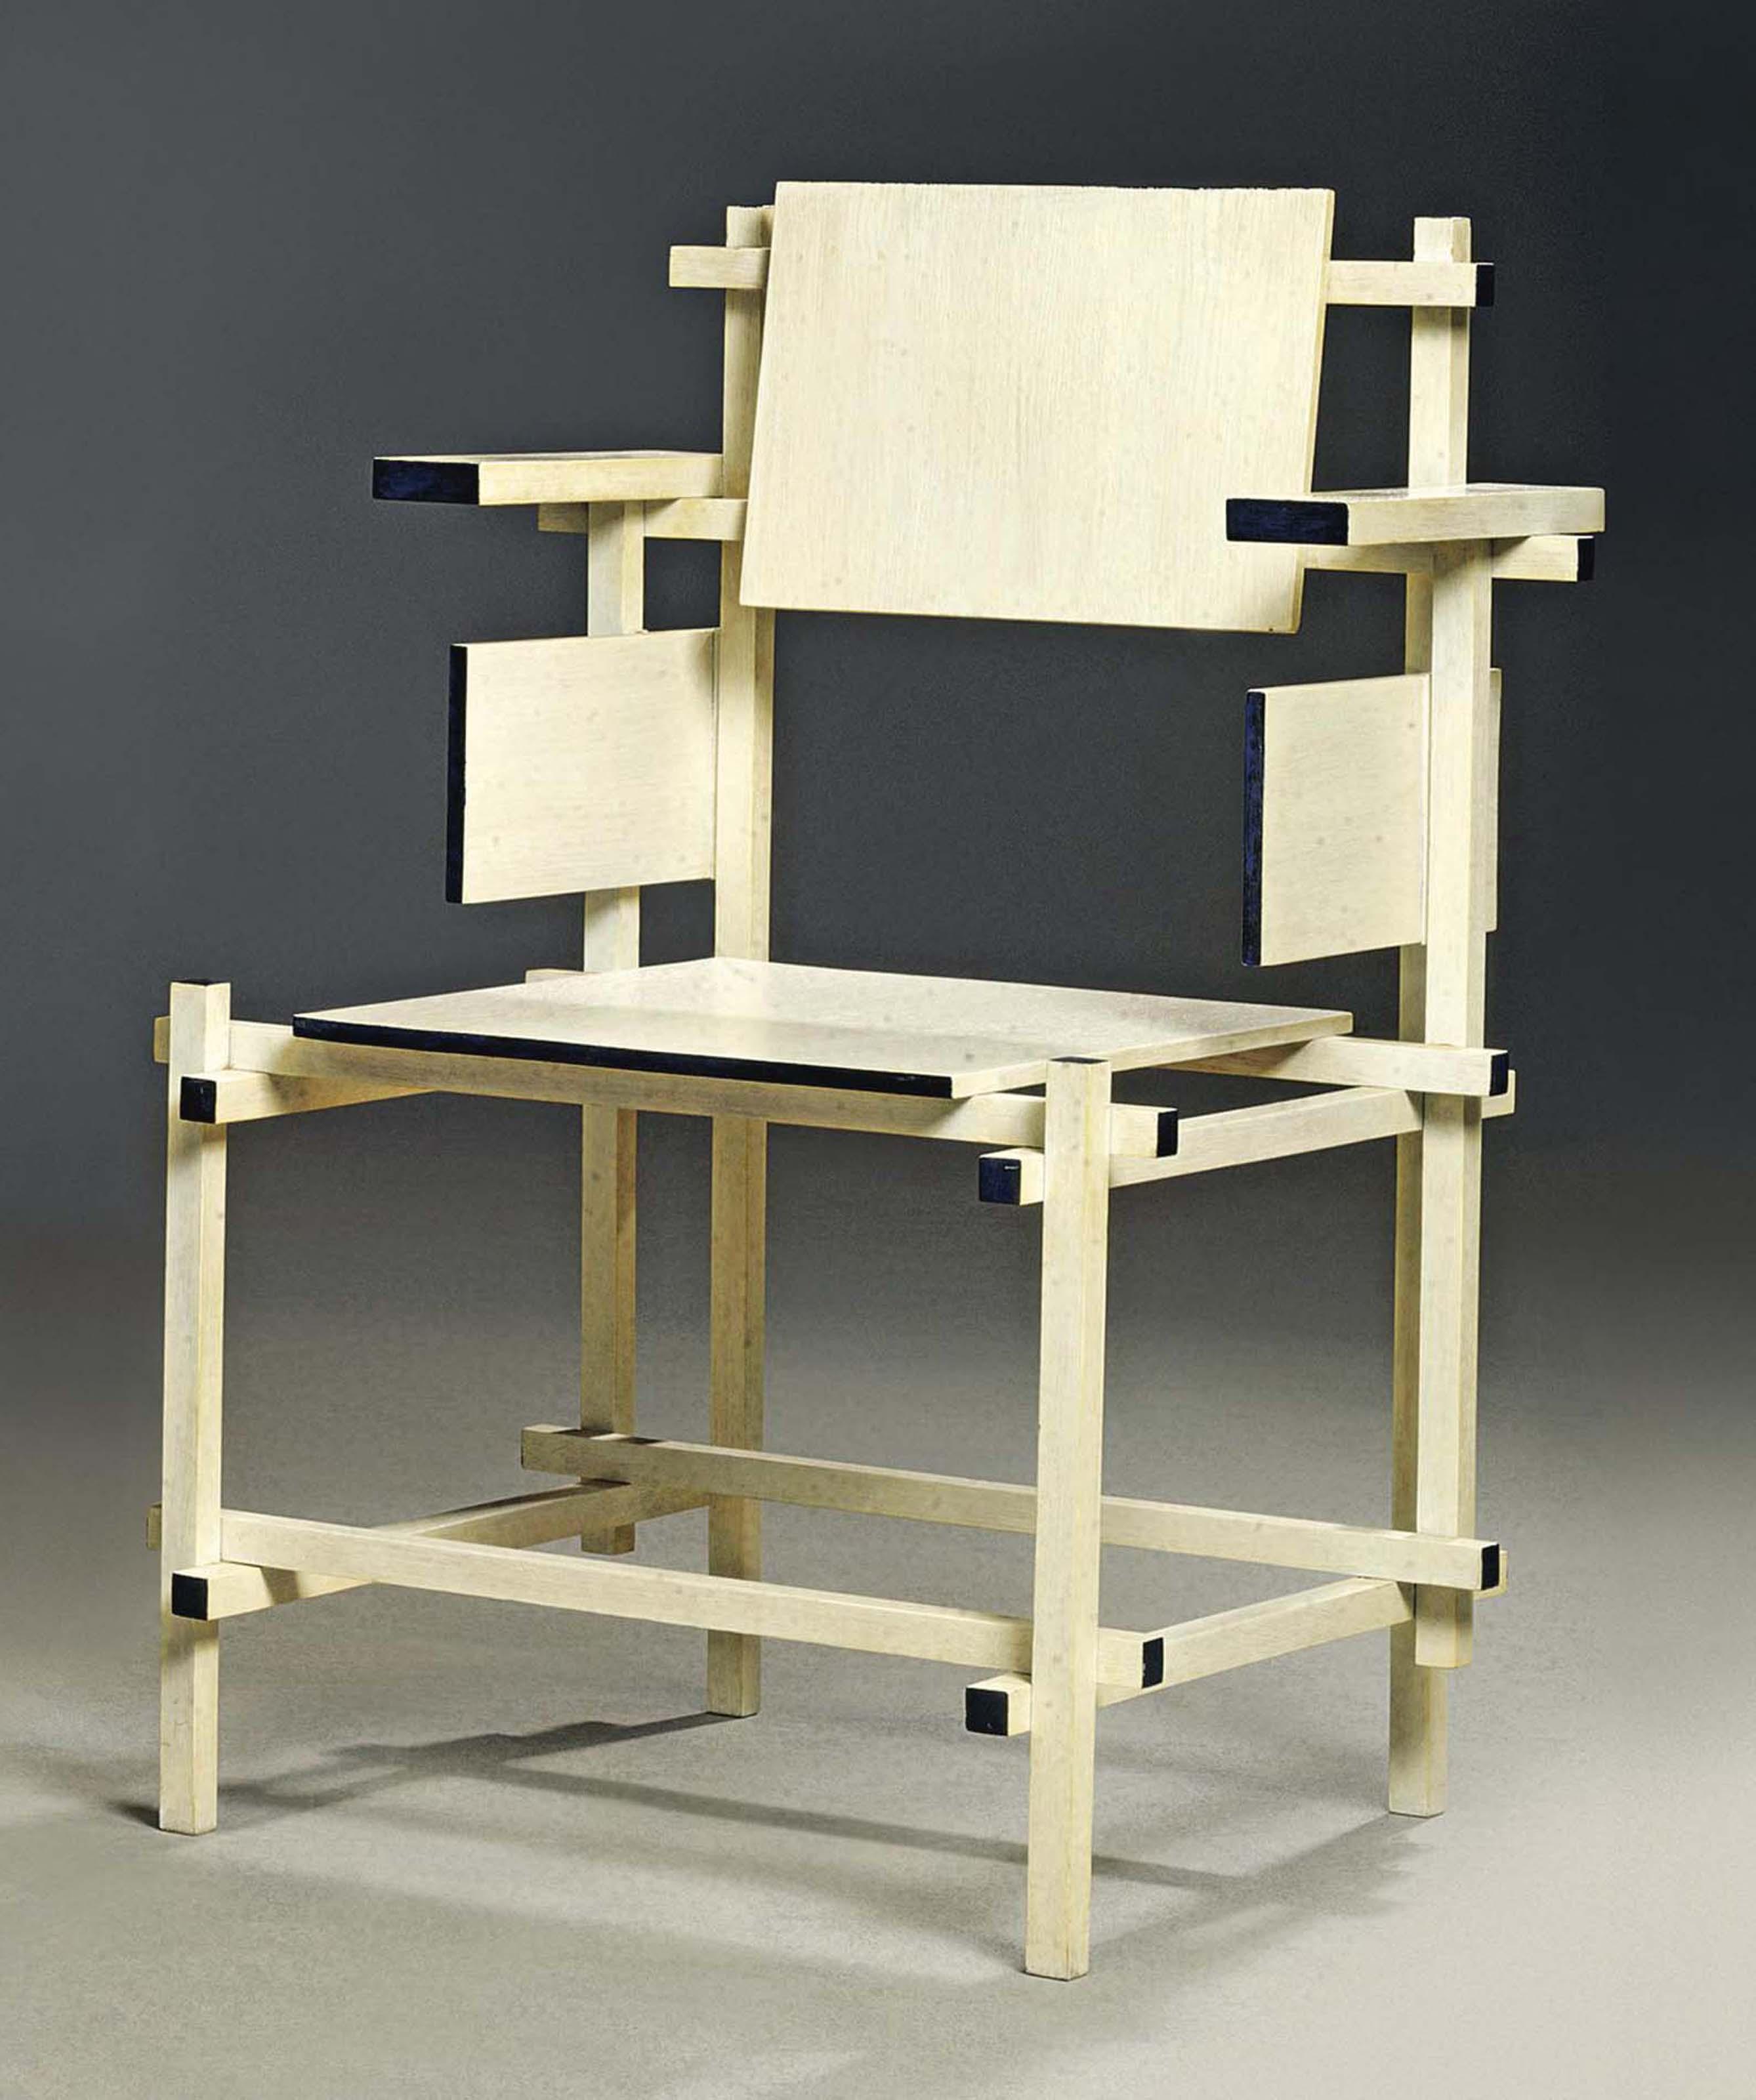 gerrit thomas rietveld chair desk on carpet 1888 1964 dining